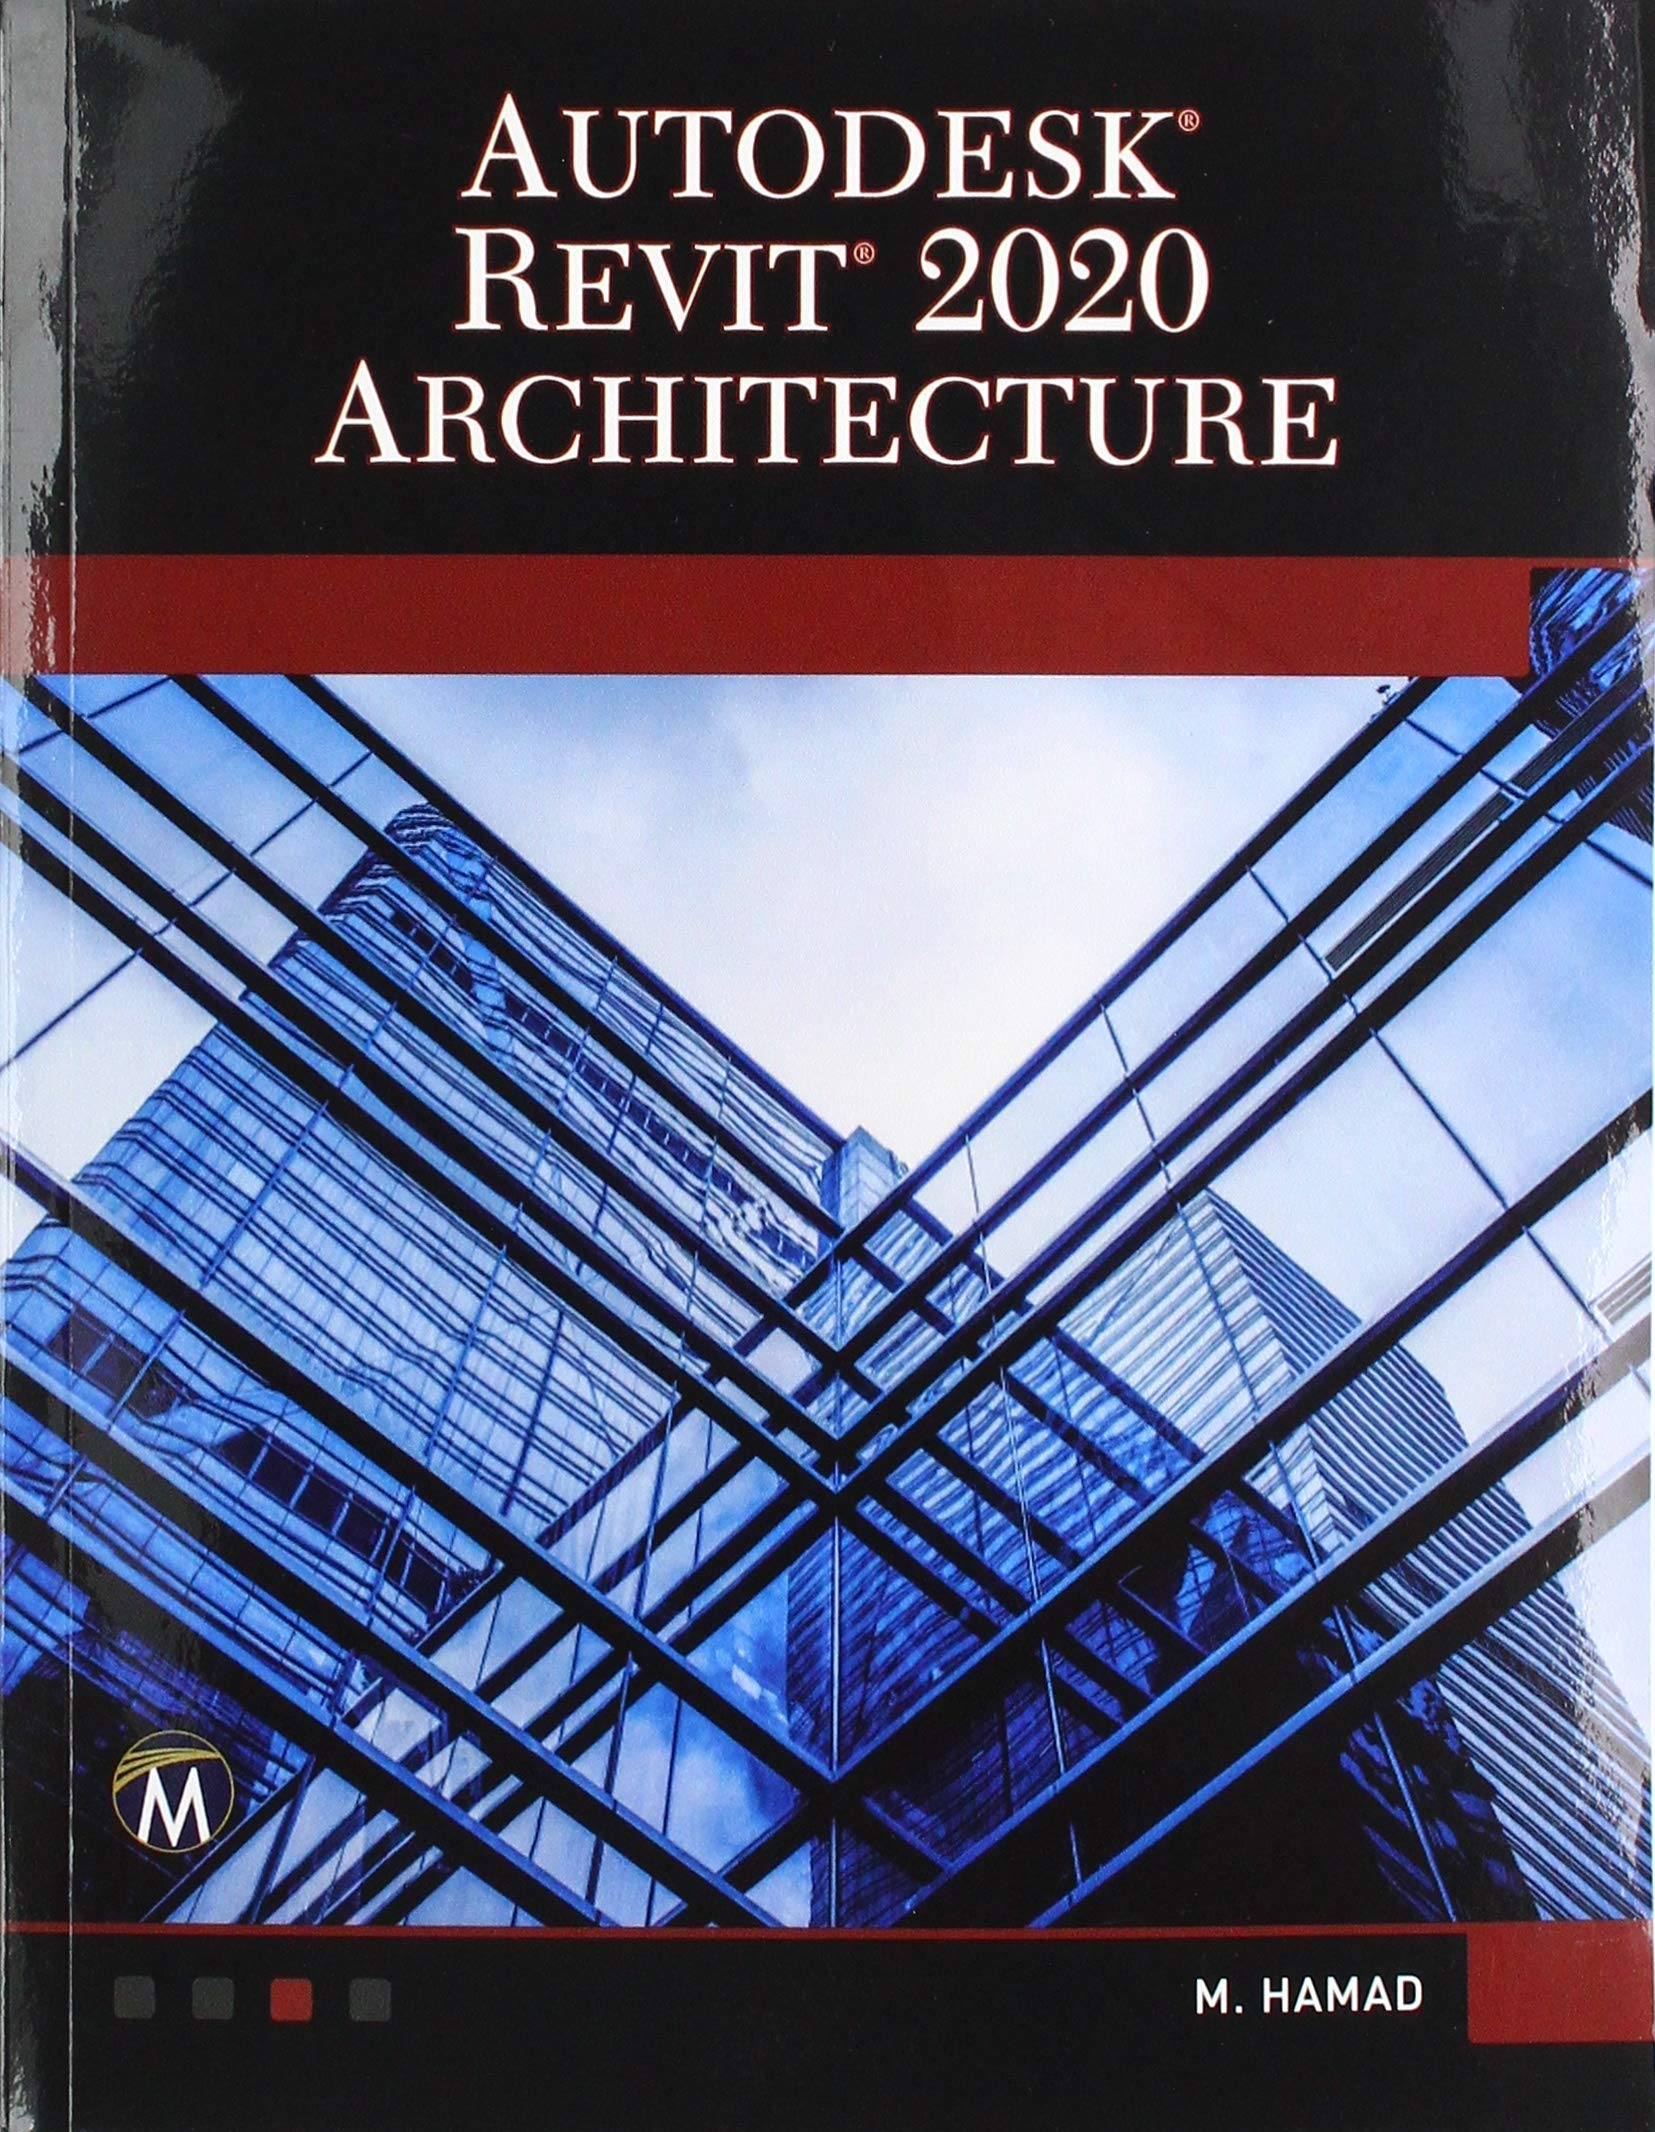 Autodesk Revit 2020 Architecture: Amazon.es: Hamad, Munir: Libros en idiomas extranjeros